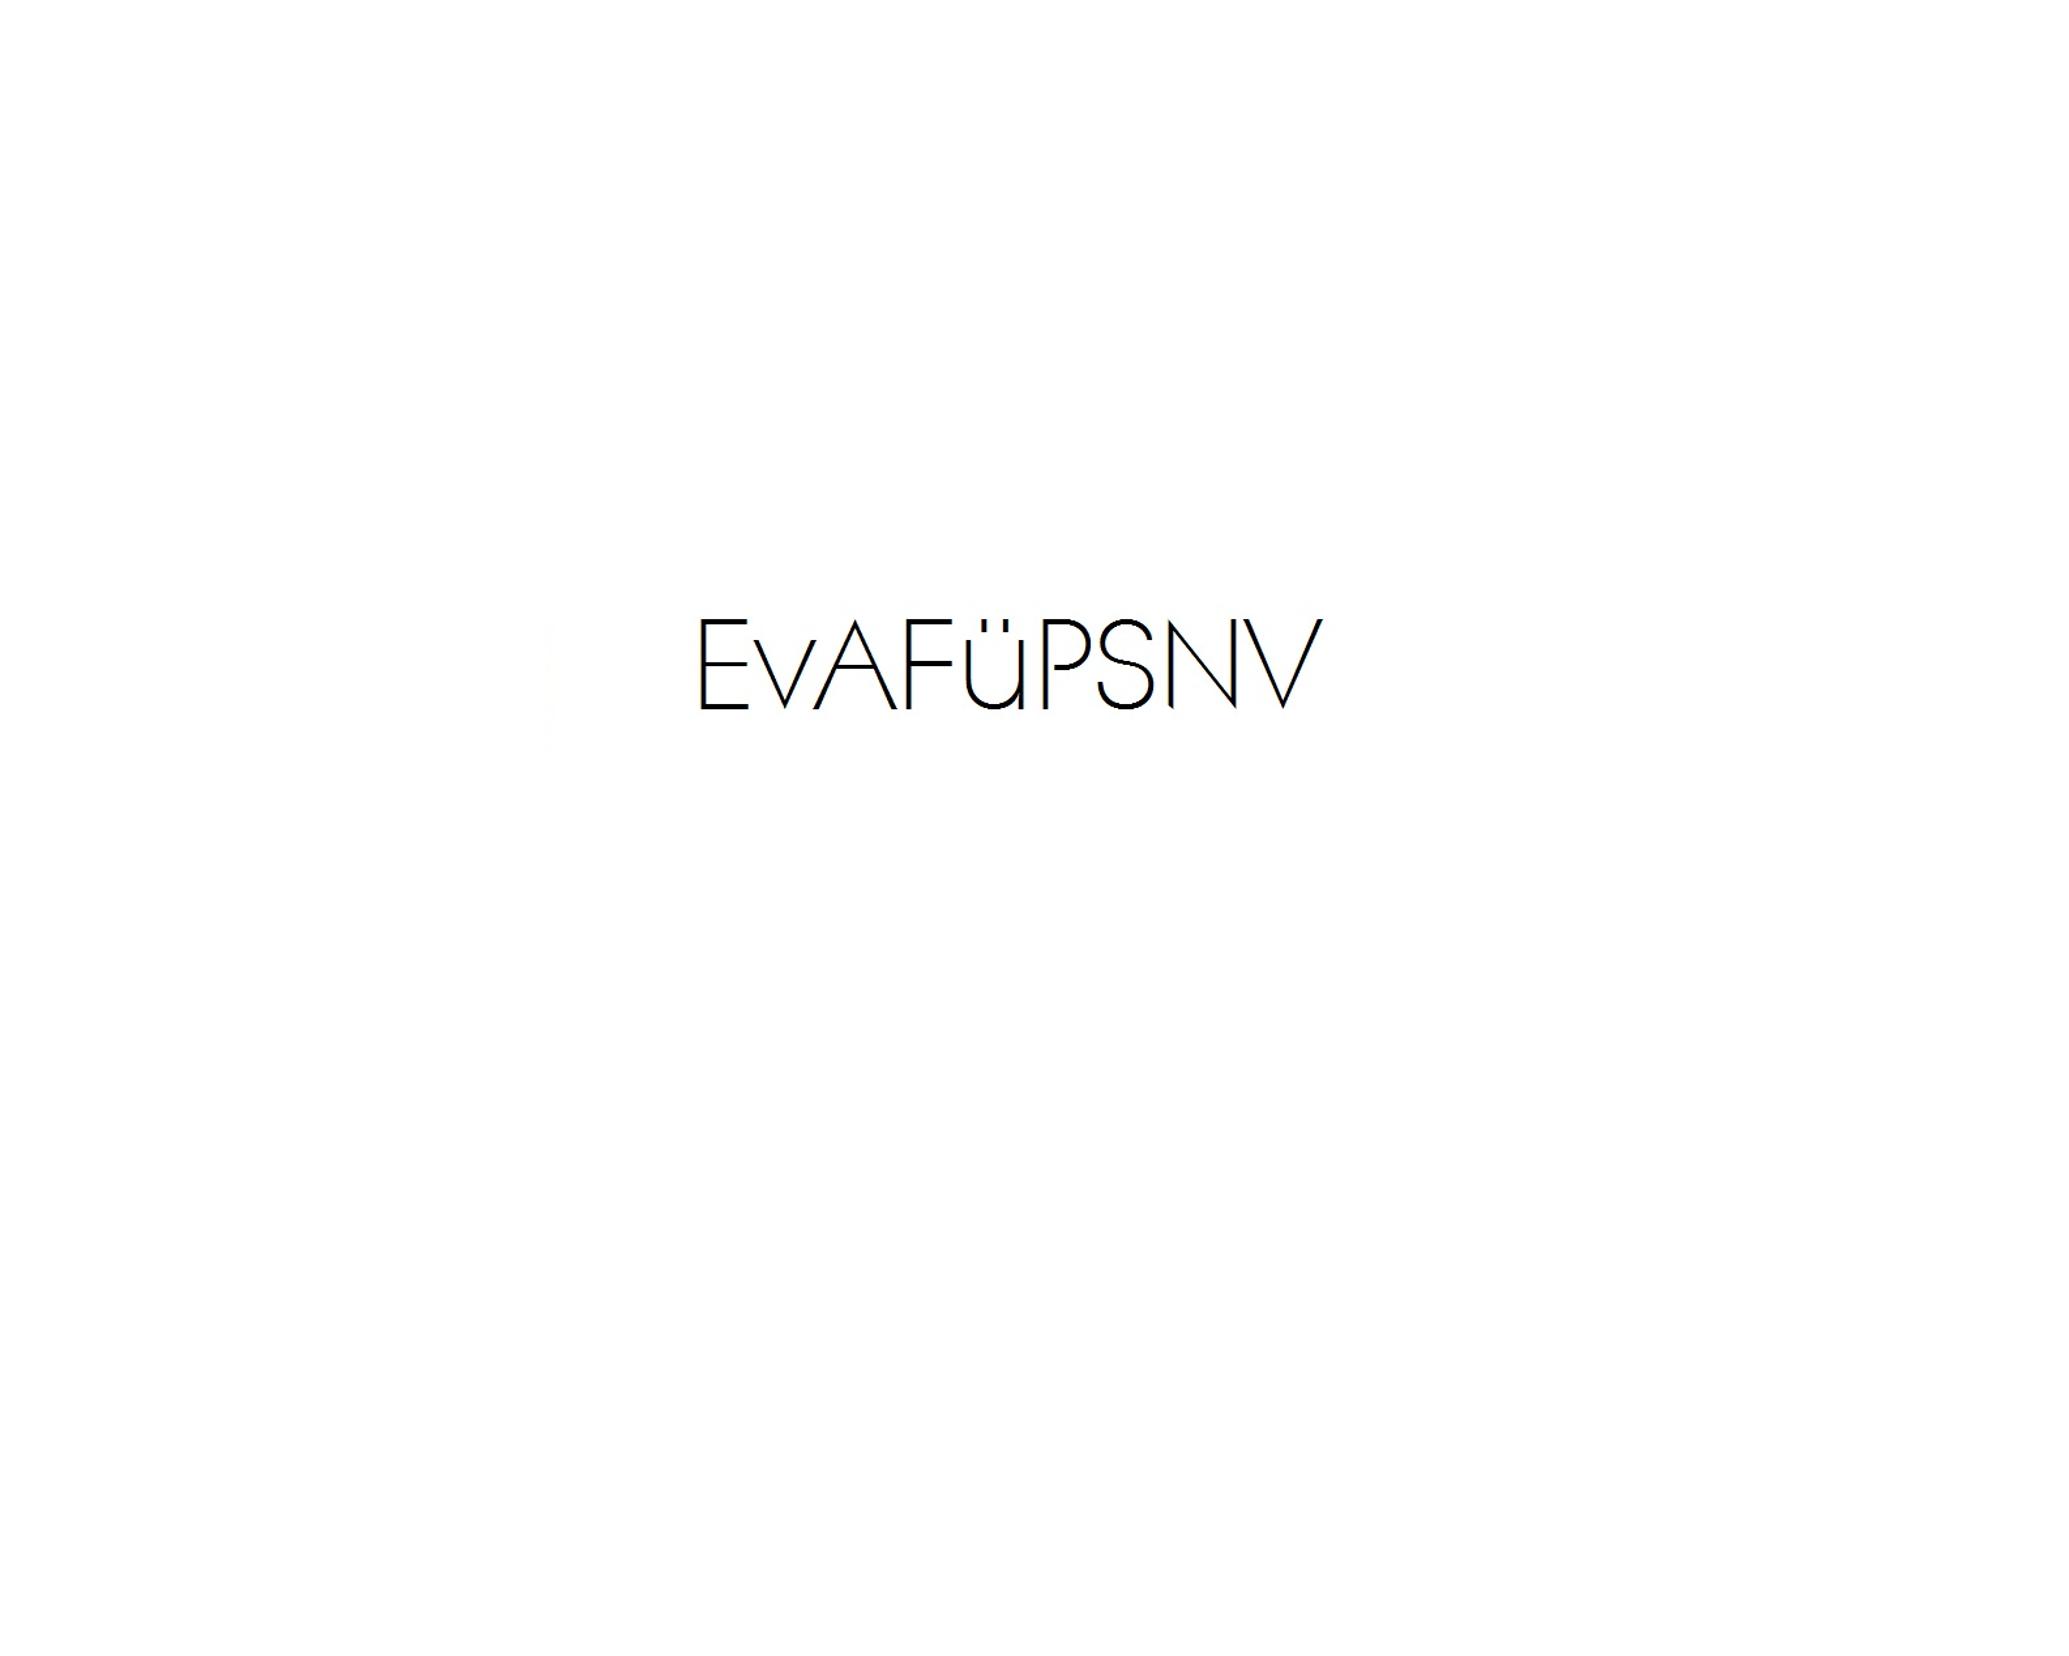 EvAFüPSNV